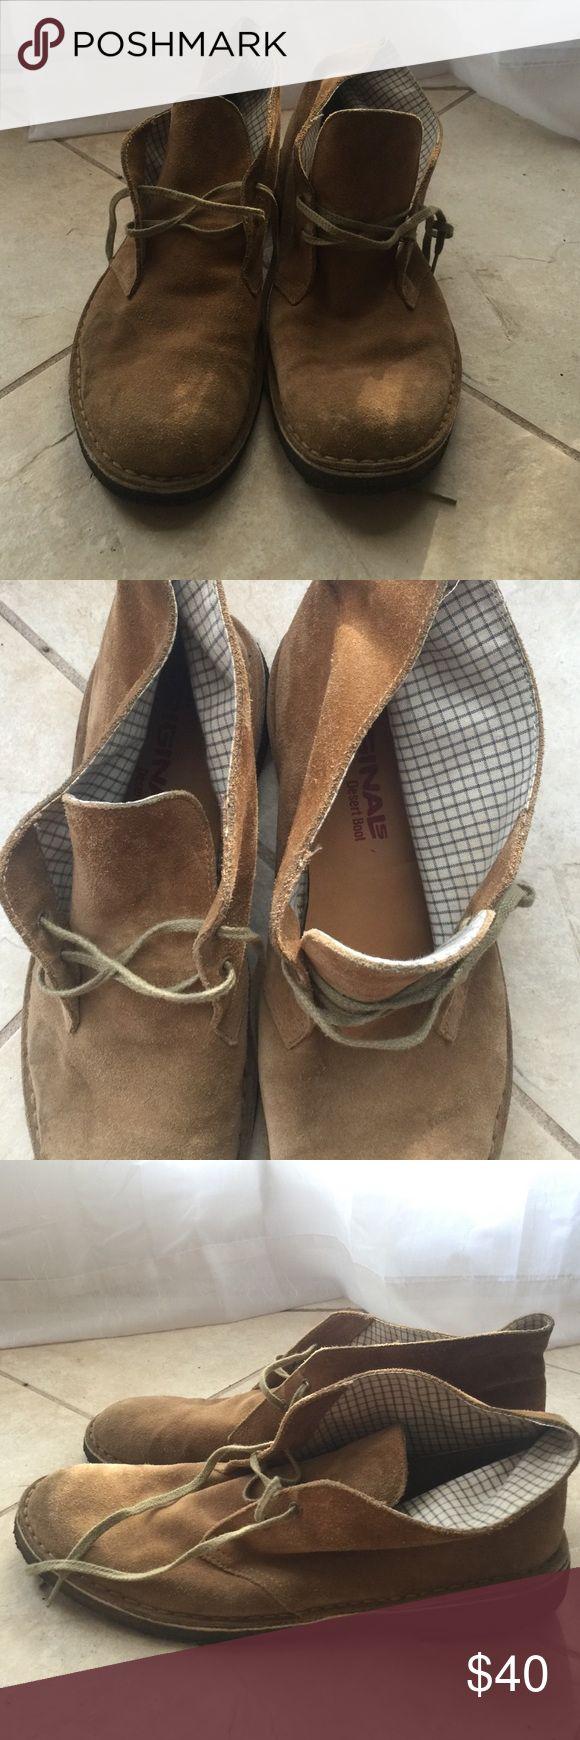 Men's leather Clarks. Clarks original desert boot. So hipster! Clarks Shoes